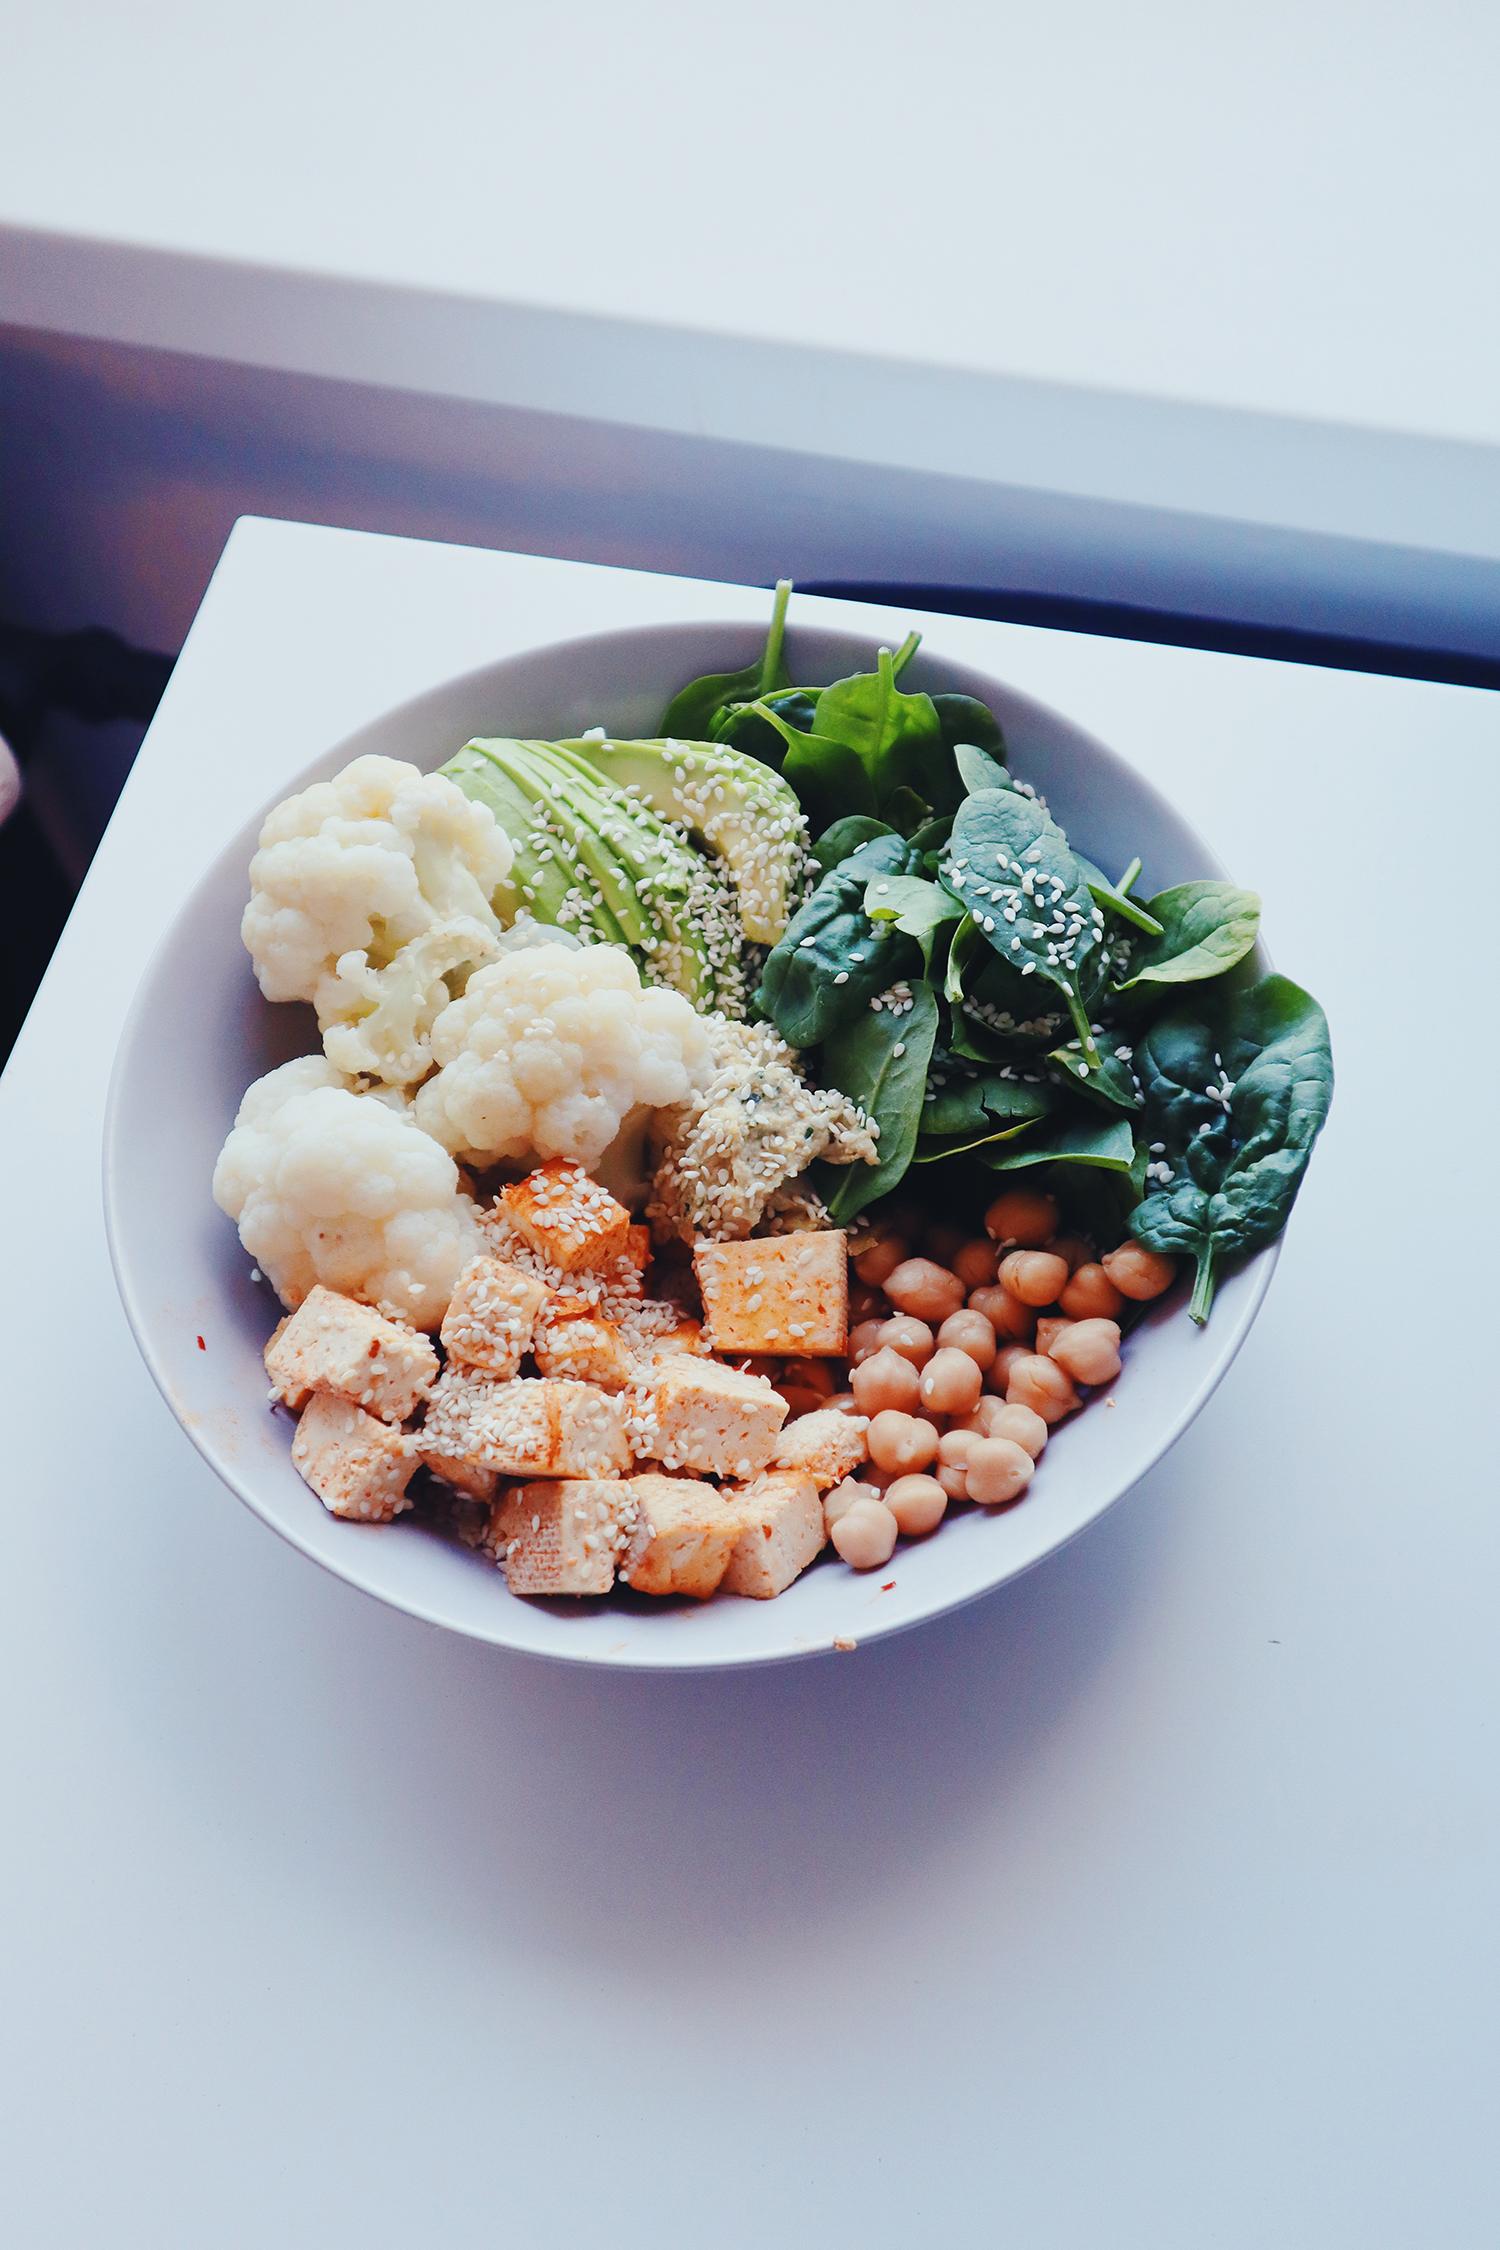 Wegański lunch bowl